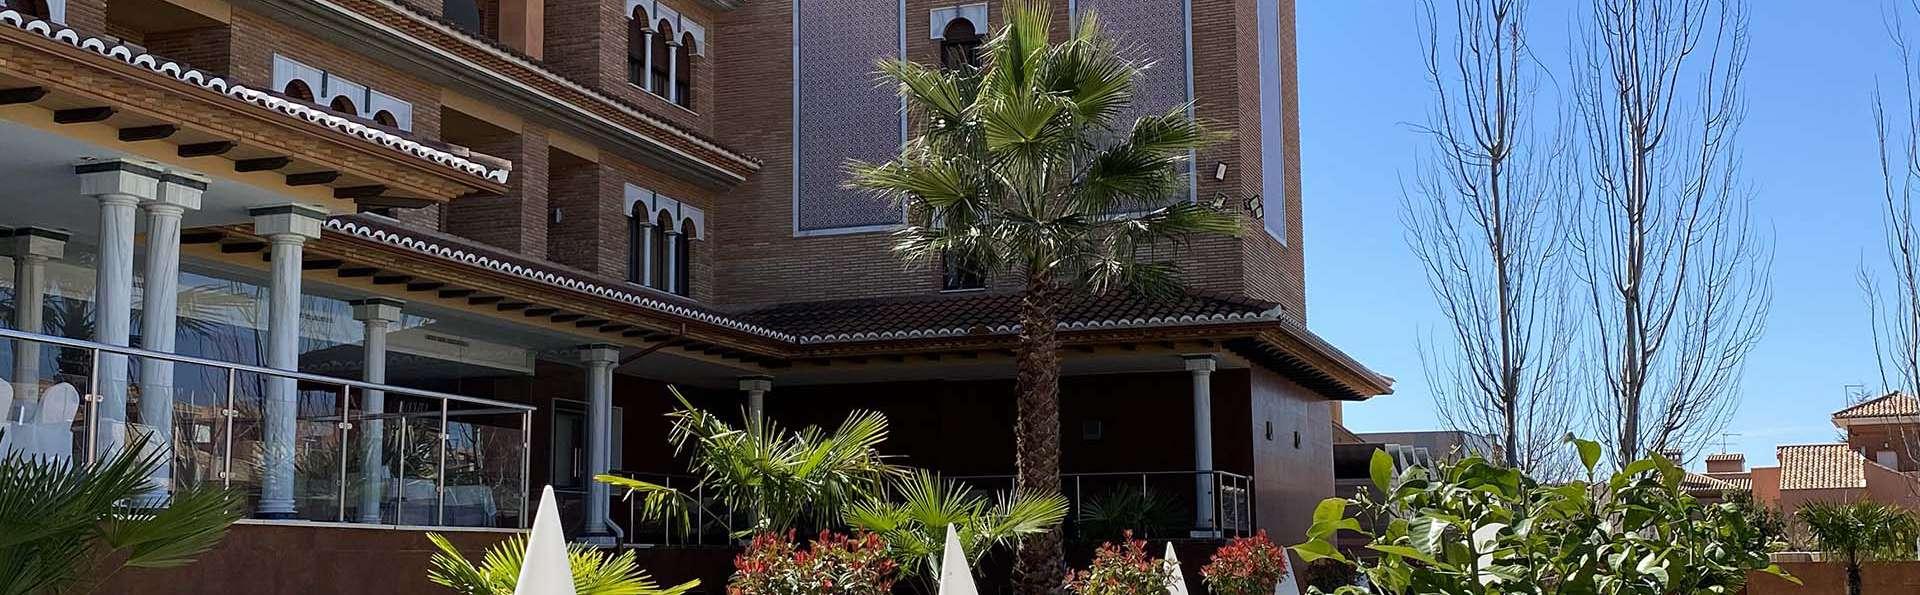 Hotel Granada Palace - EDIT_GARDEN.jpg